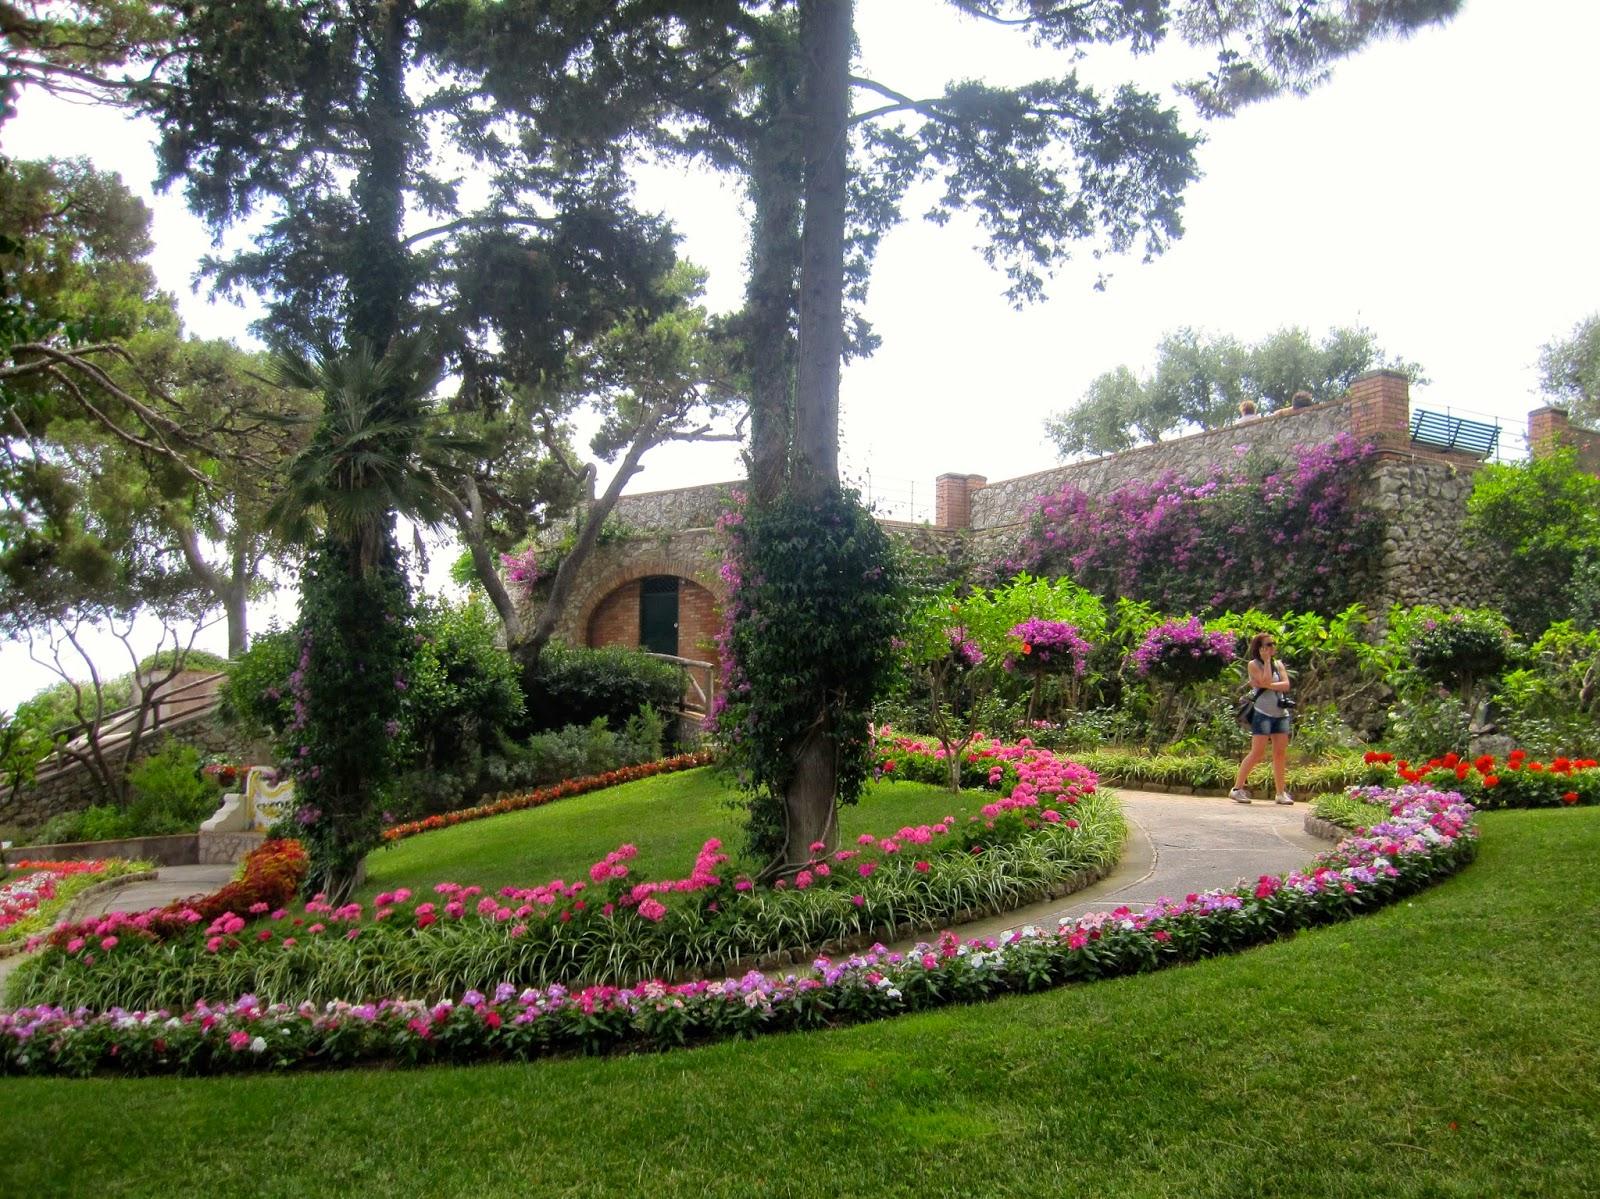 destination fiction gardens of augustus capri